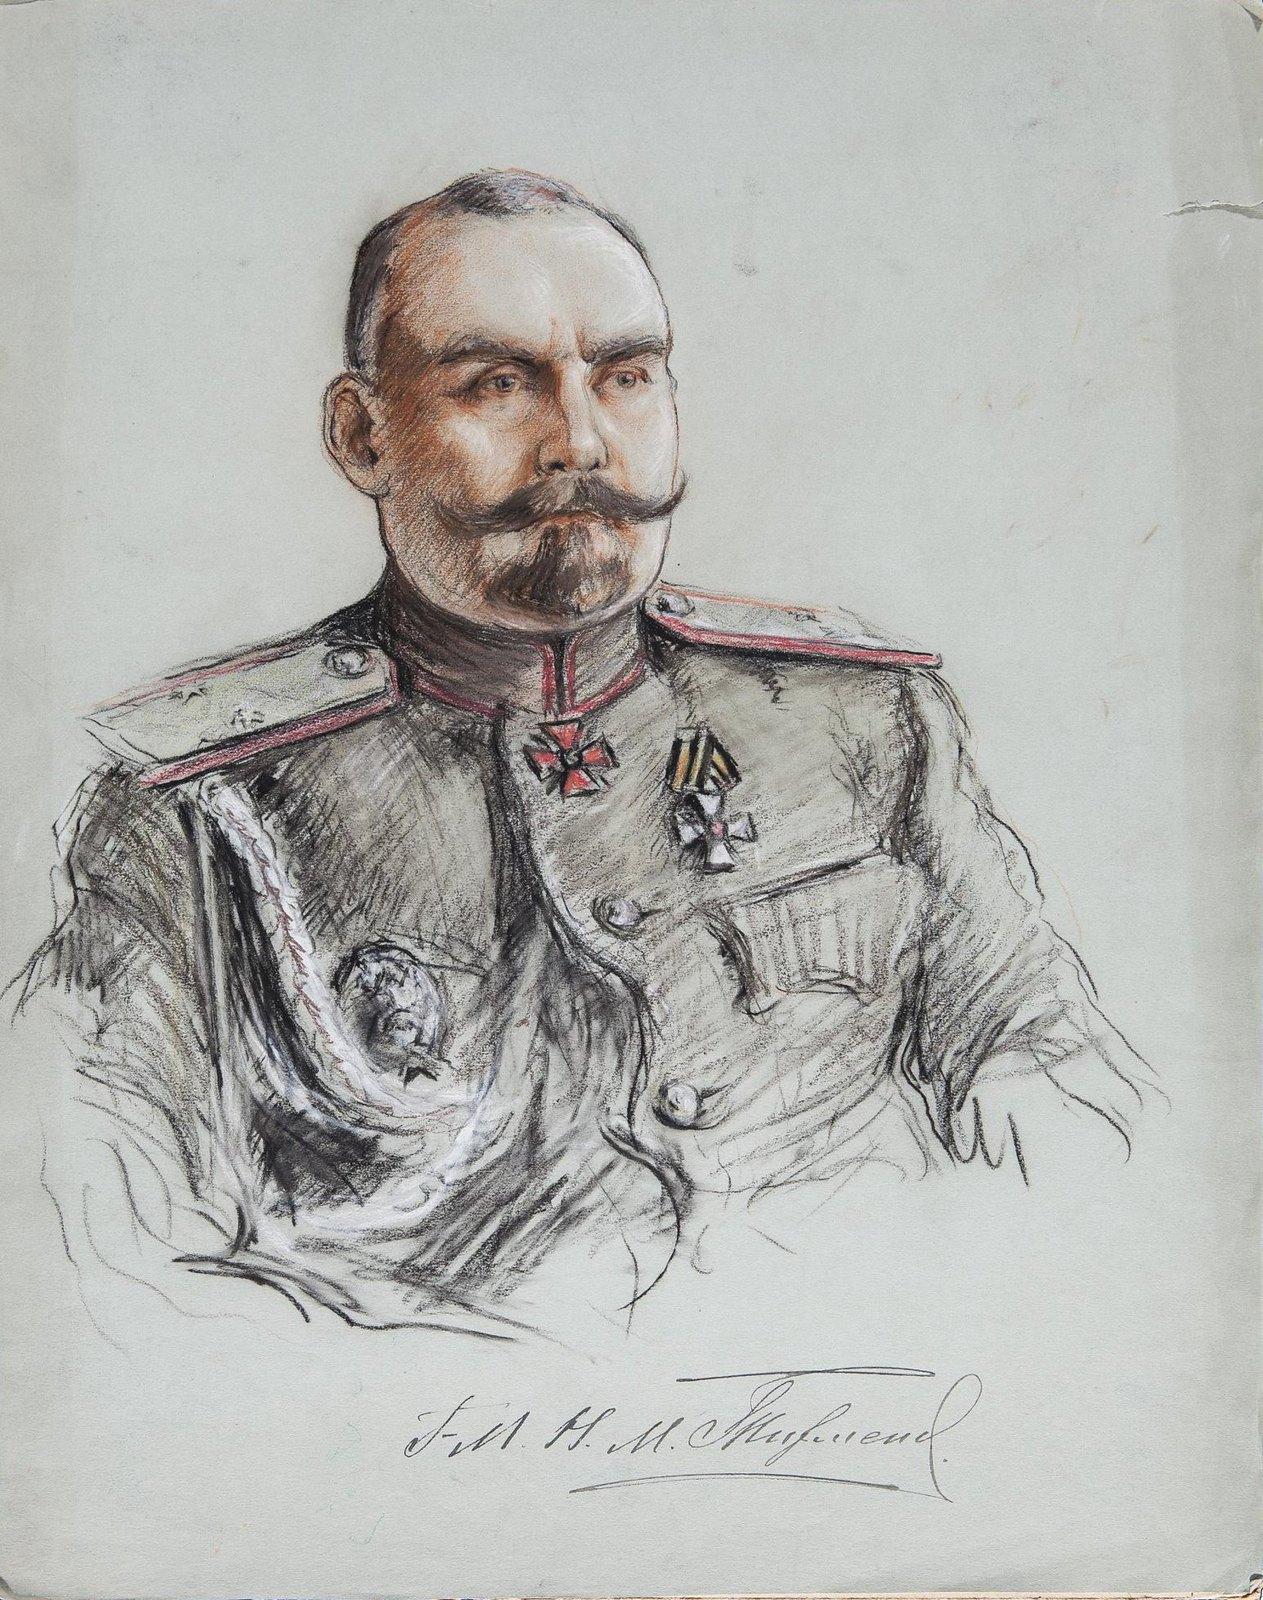 1916. Портрет генерал-майора Николая Михайловича Тихменева (1872-1954)